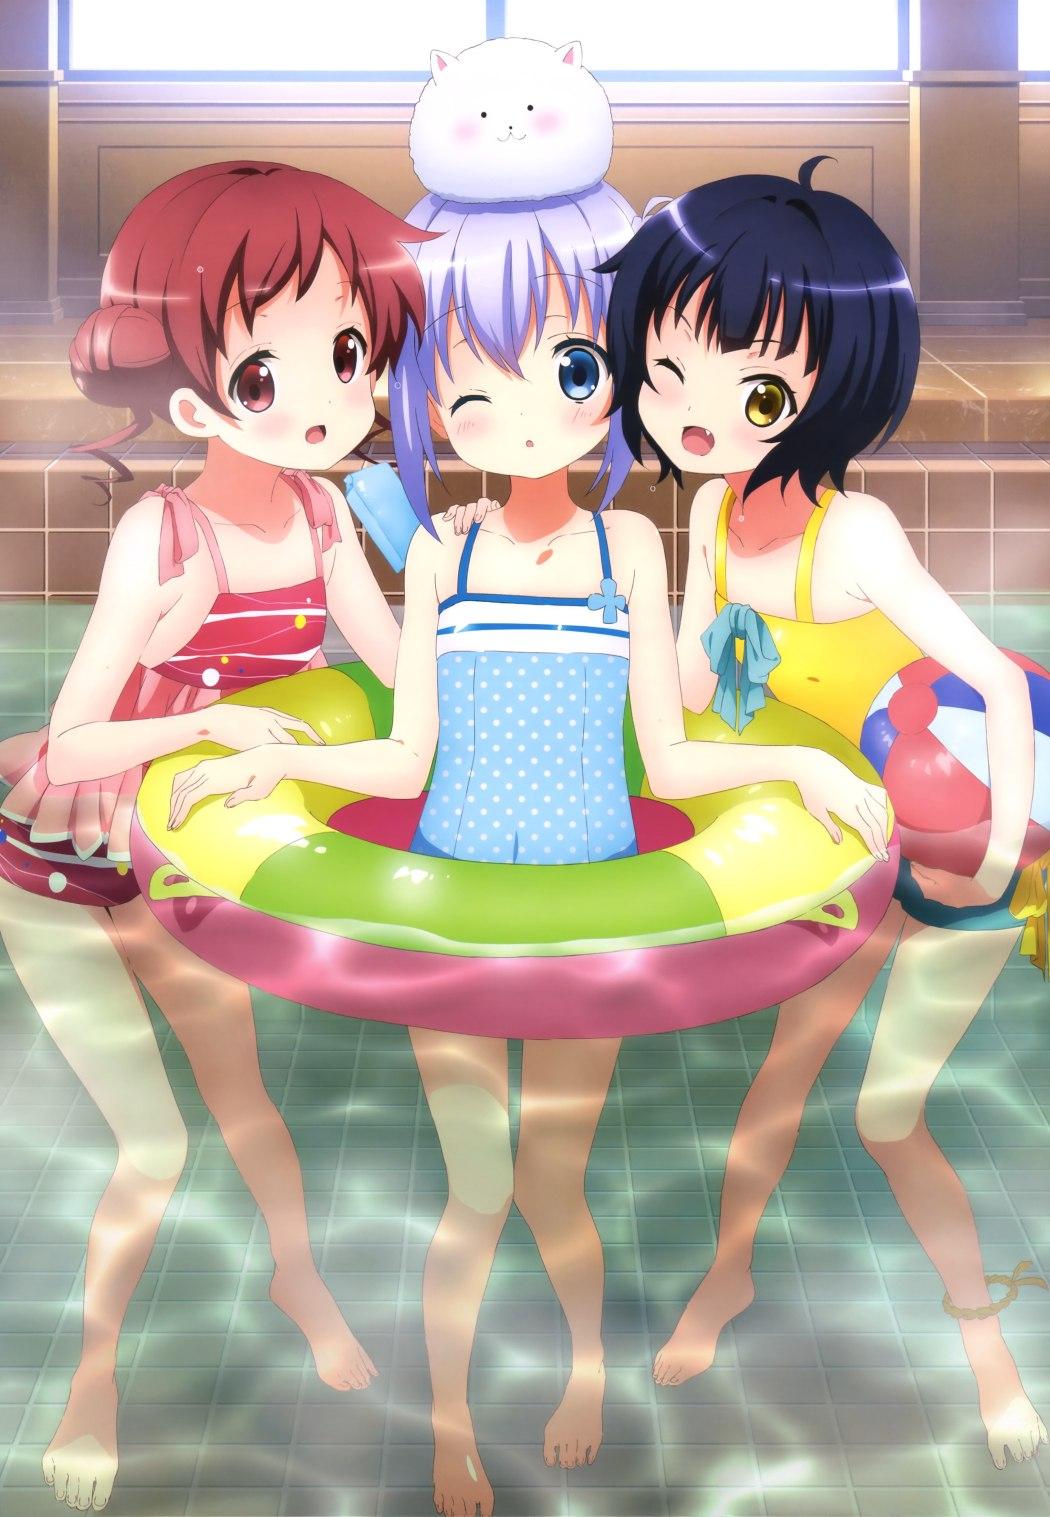 NyanType Magazine November 2015 anime posters gochuumon wa usagi desu ka